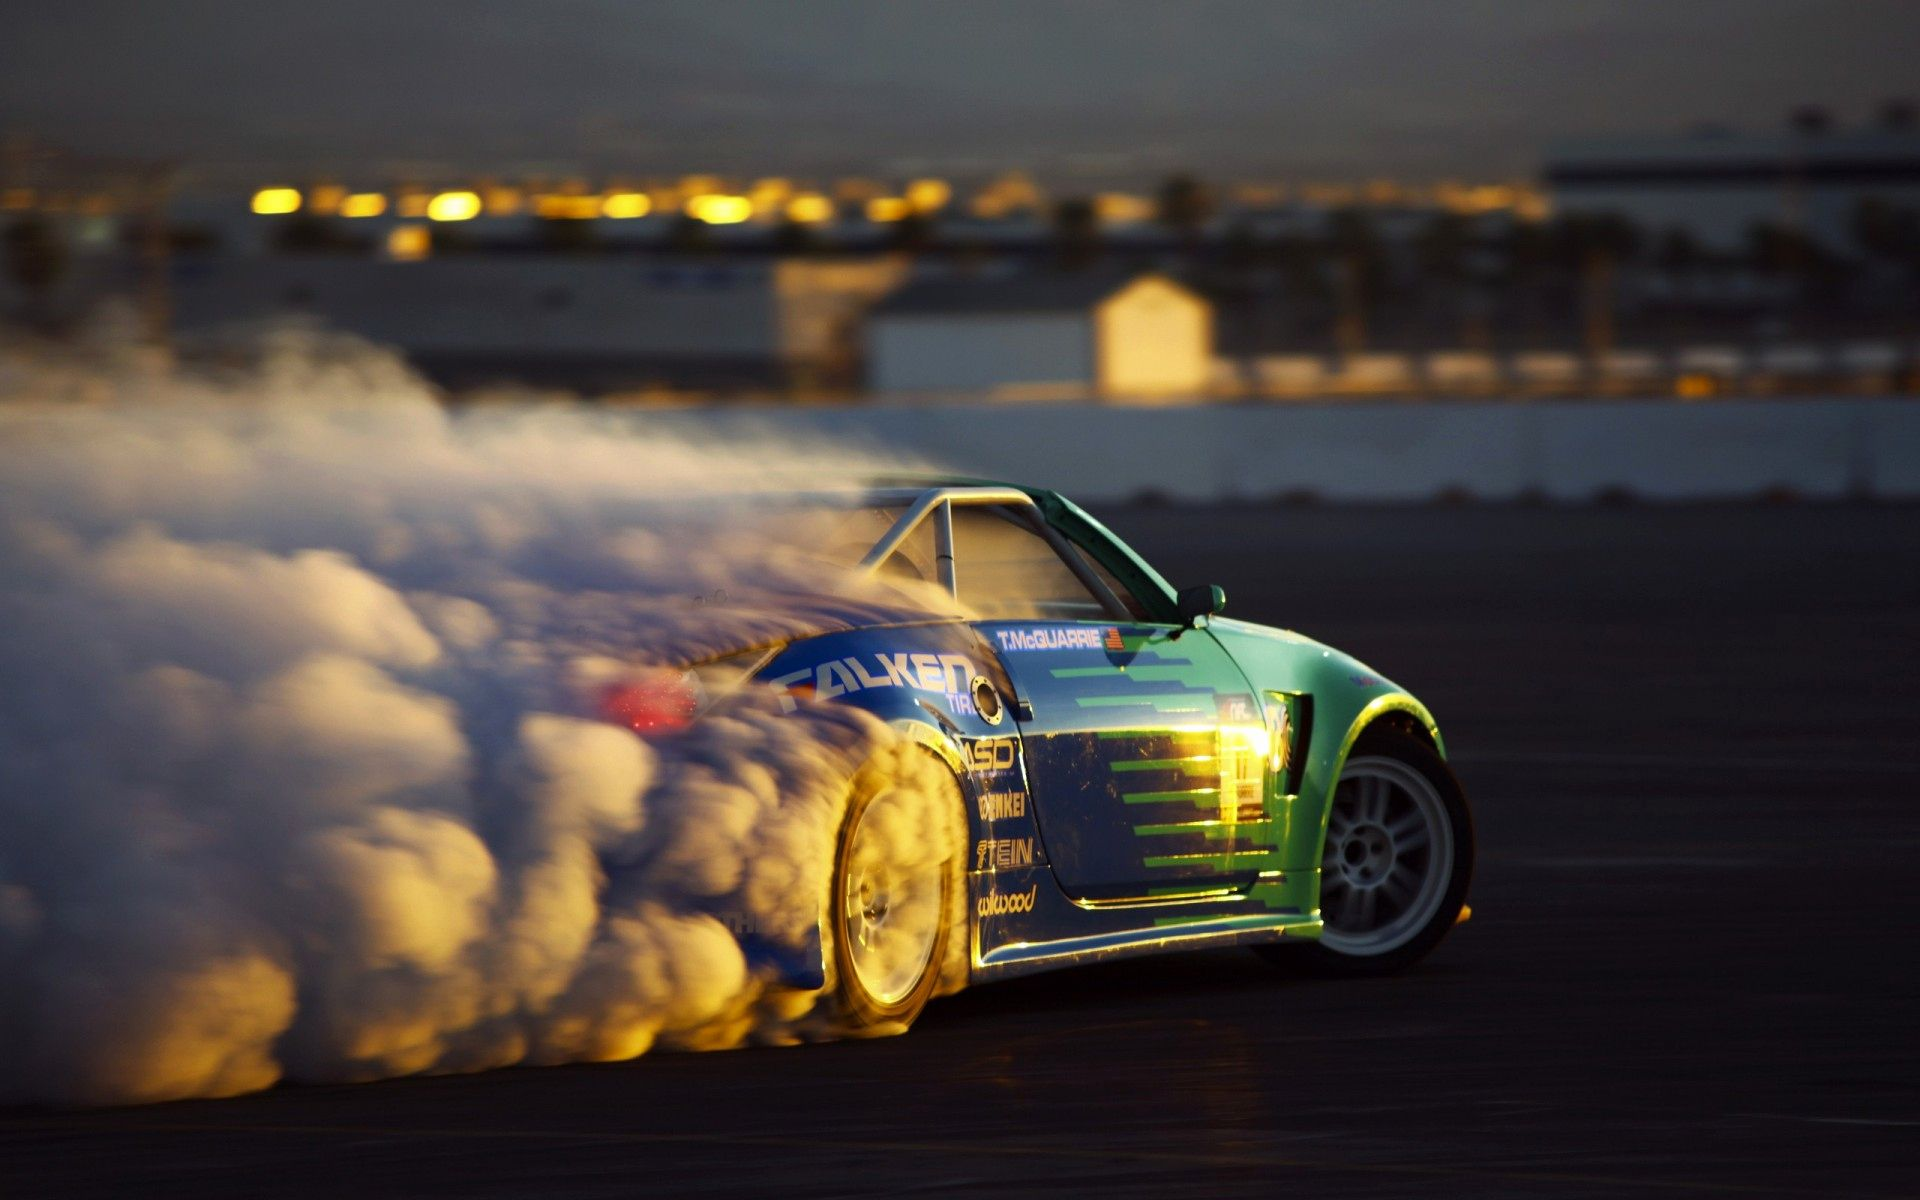 Drift Cars Wallpapers Top Free Drift Cars Backgrounds Wallpaperaccess